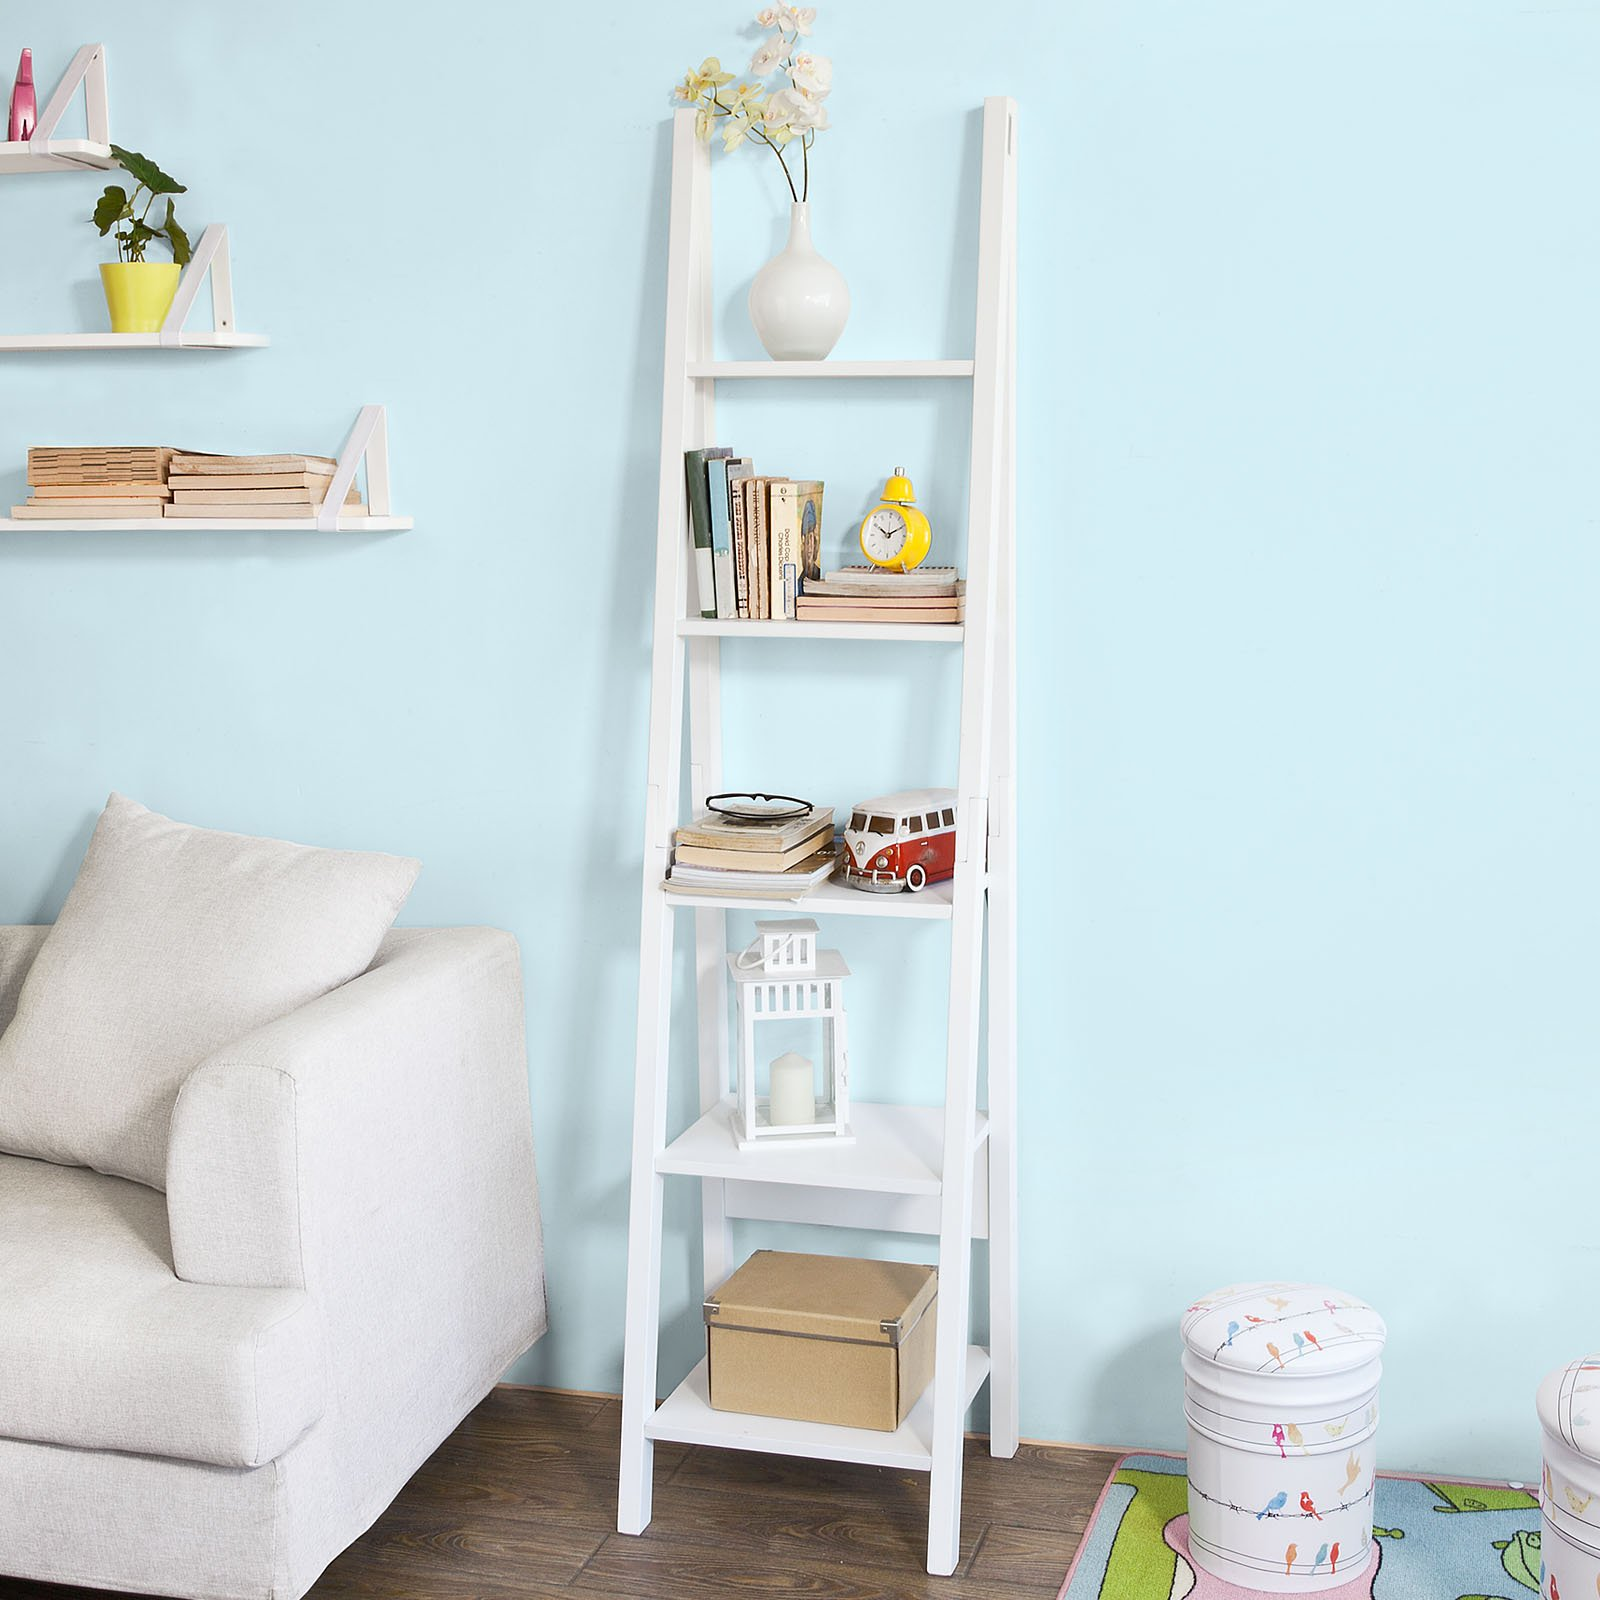 SoBuy Modern ladder bookcase made of wood, book shelf,stand shelf, wall shelf (FRG101-W)